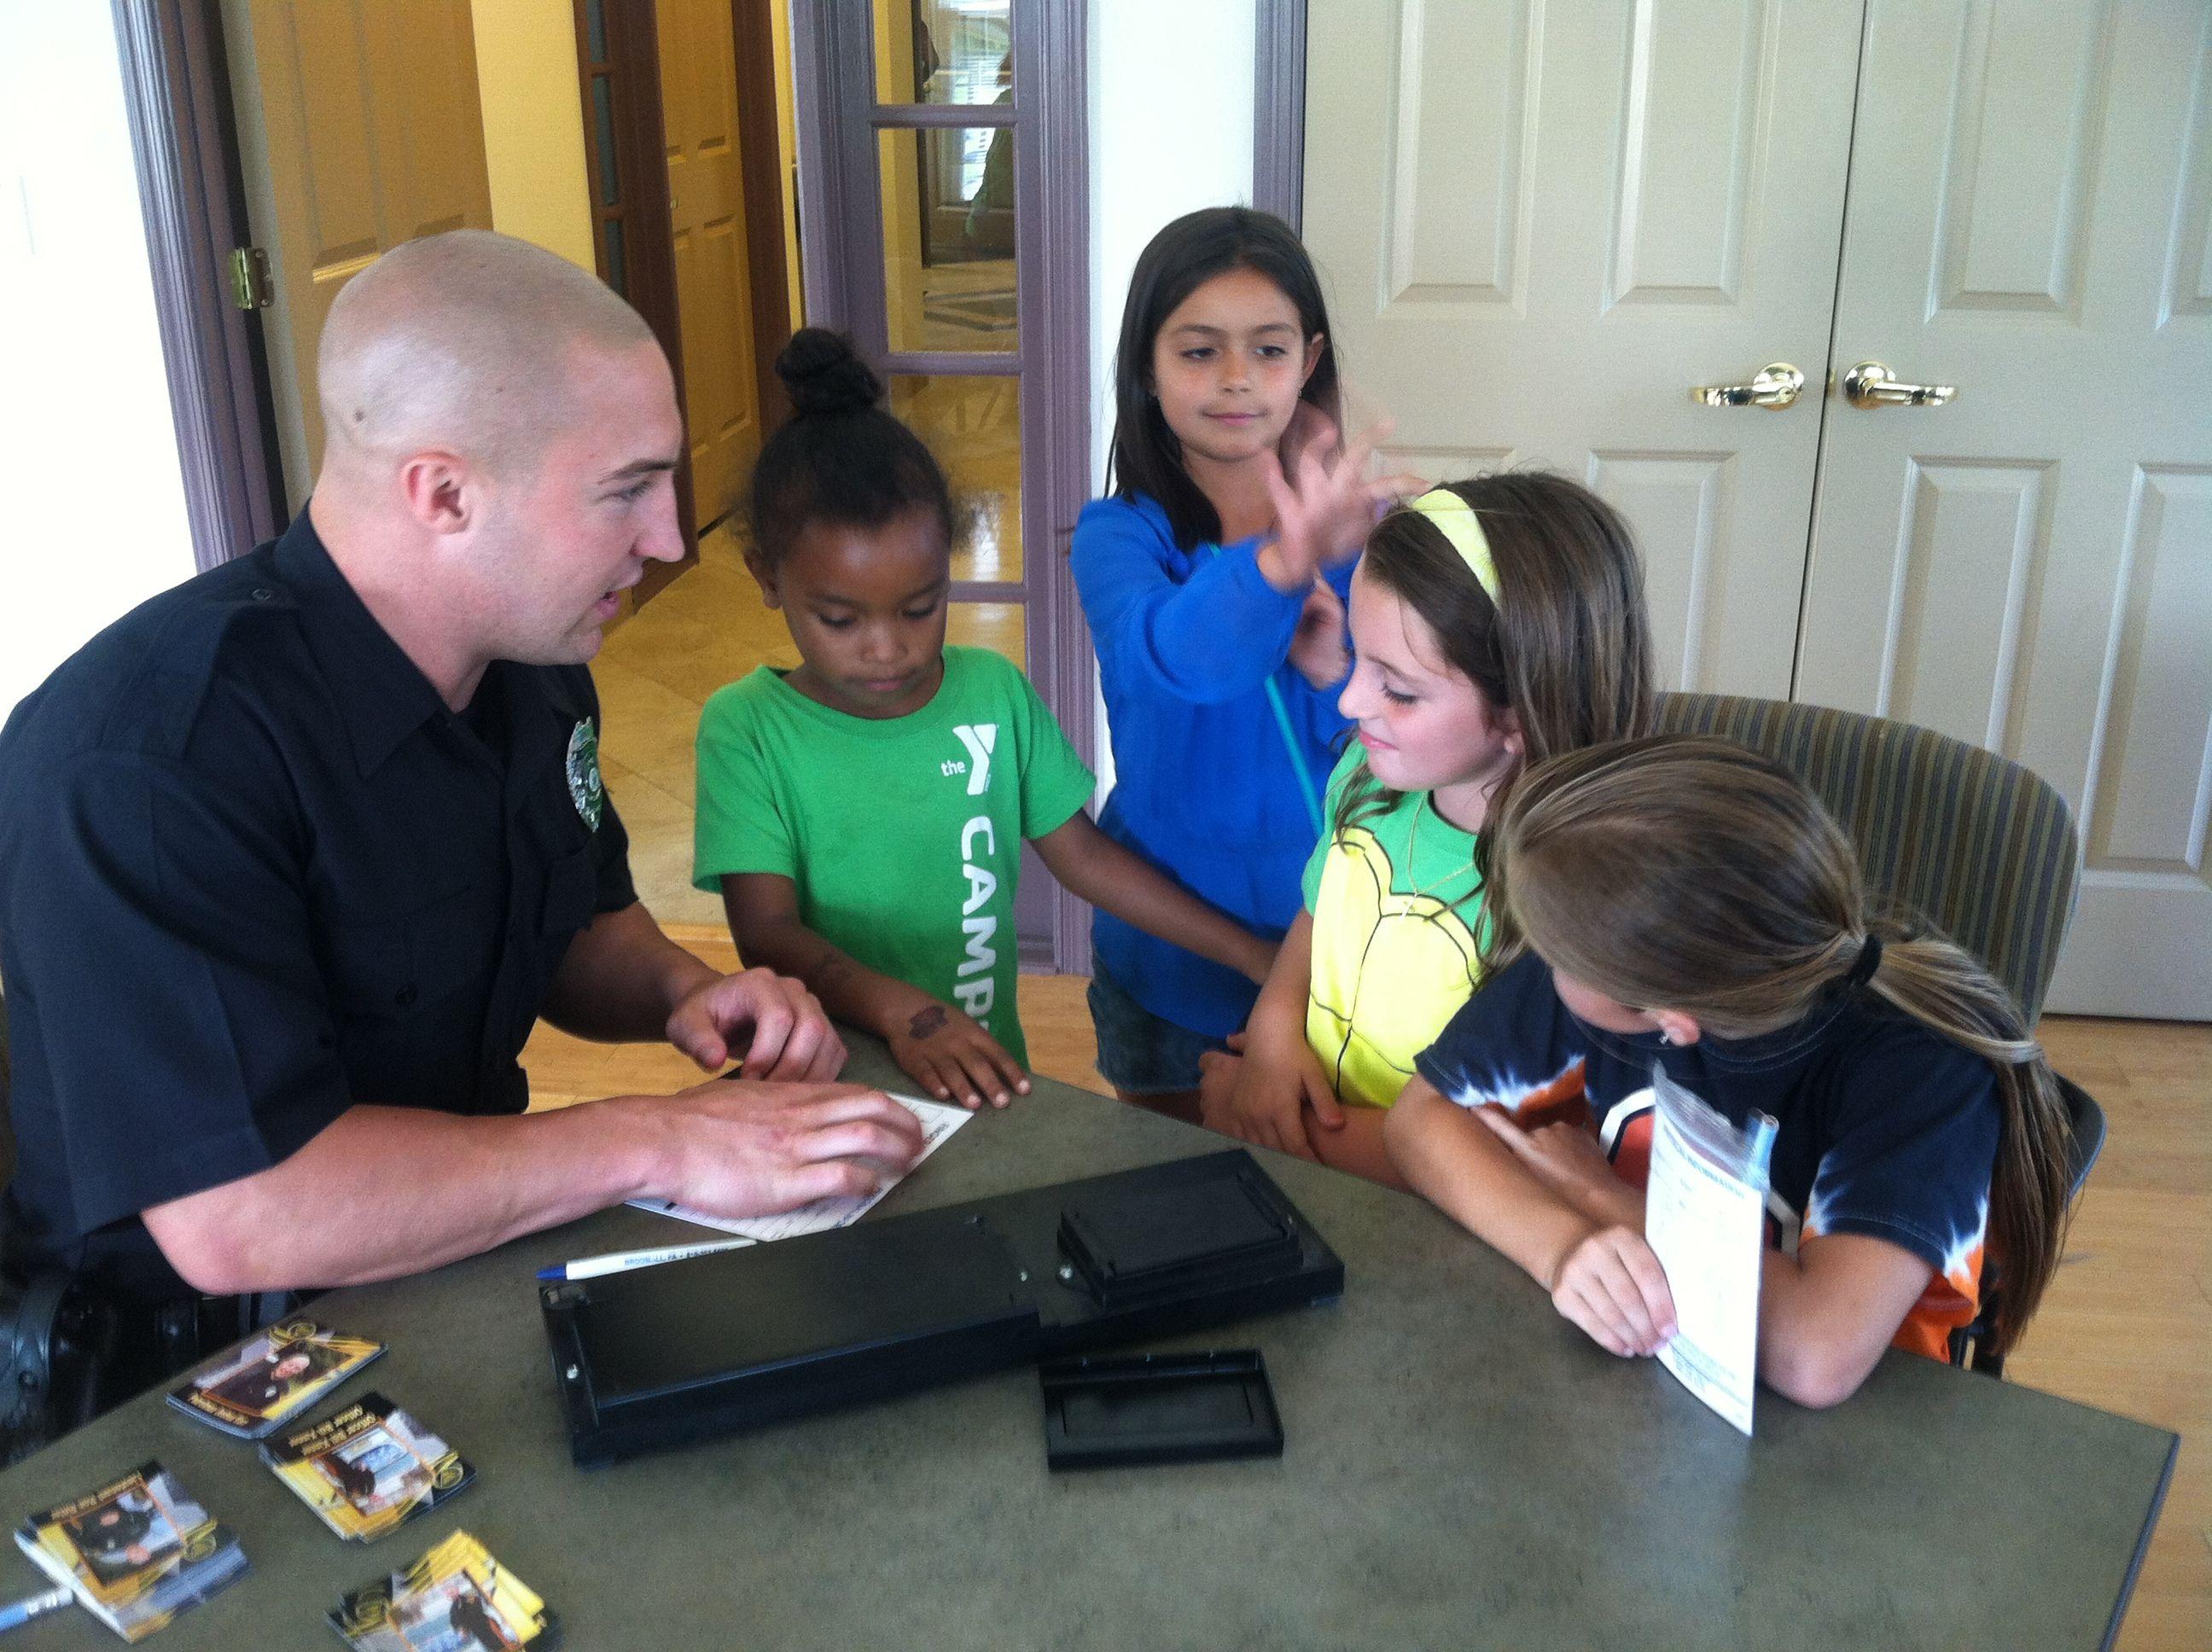 Ofc. Kerr filling out the safety kits. Safety kit, Child